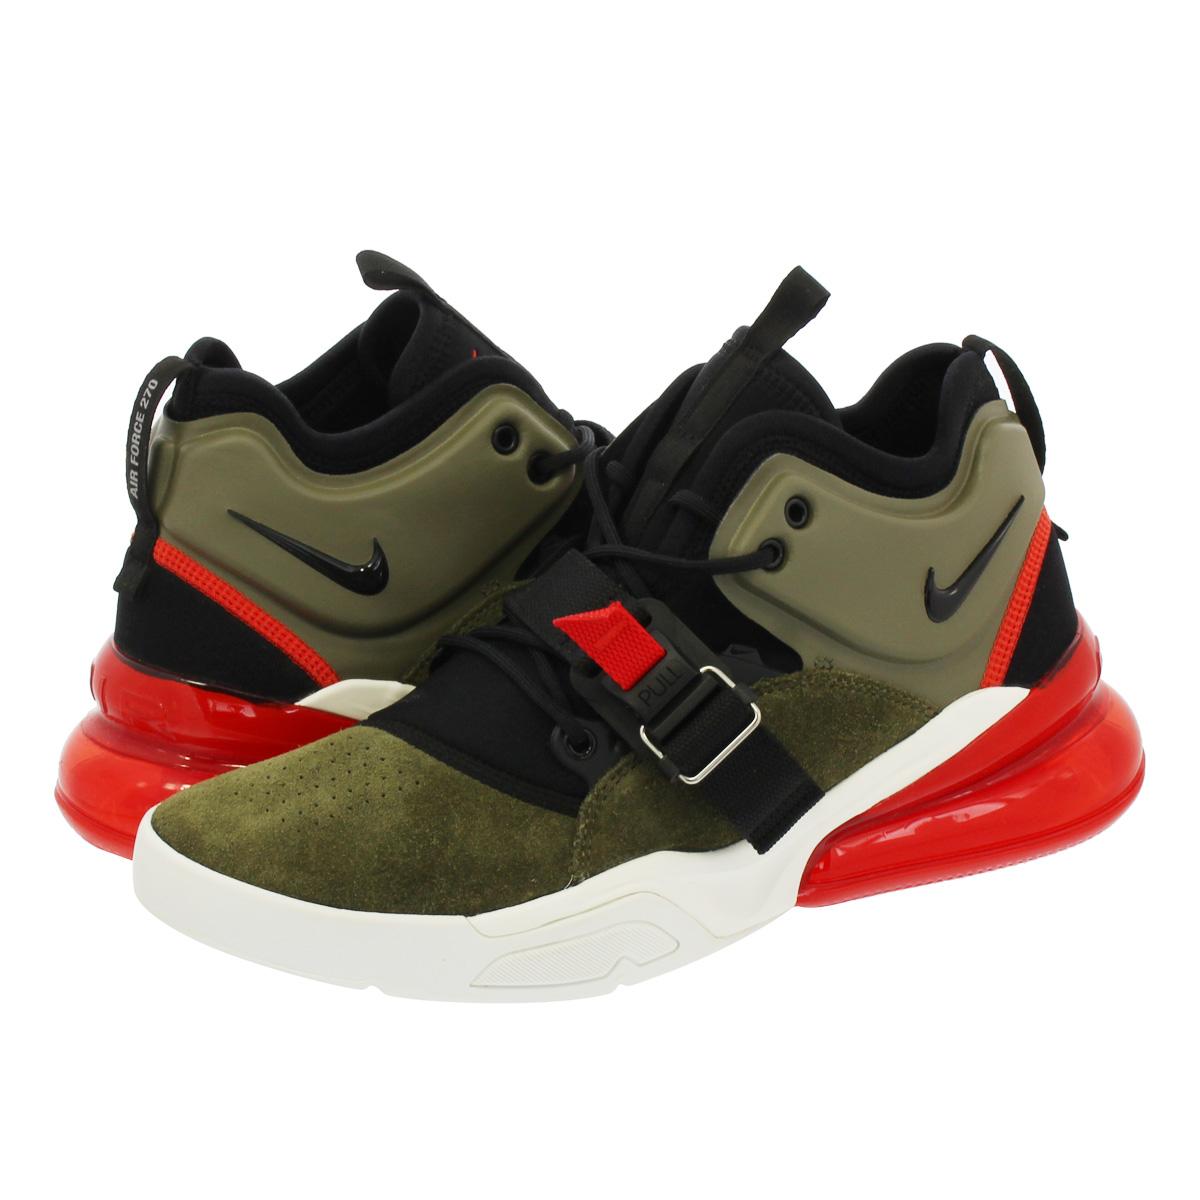 f92c6ca06d NIKE AIR FORCE 270 Nike air force 270 MEDIUM OLIVE/BLACK/CHALLENGE RED/